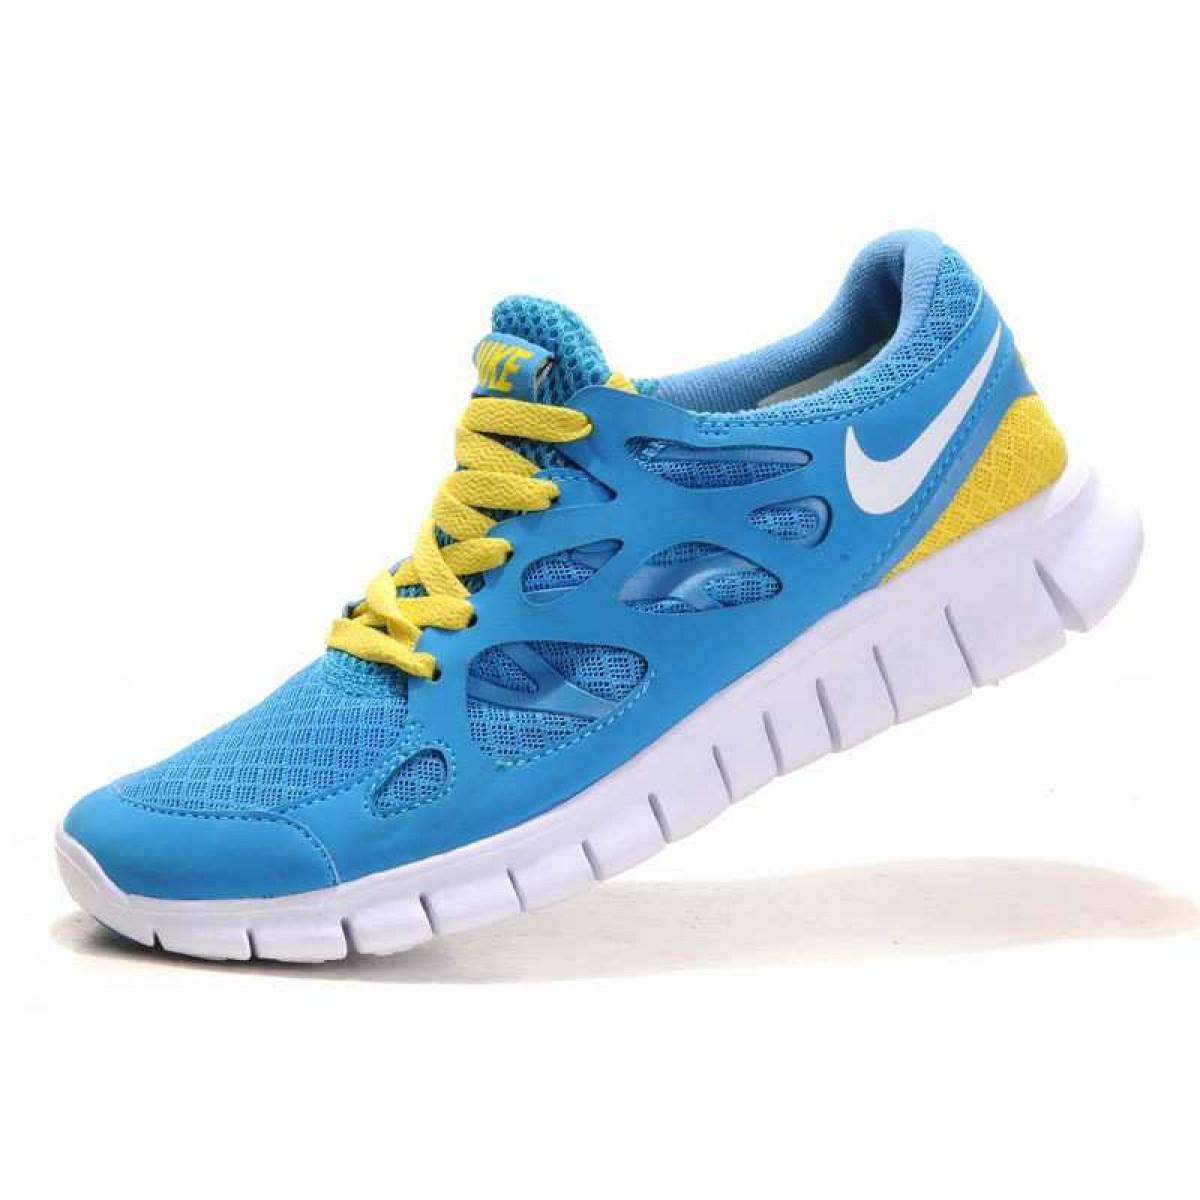 factory price 10f86 99c47 Nike Free Run 2 Femme Chaussures Bleu Jaune,nike free chaussure  online,Large choix